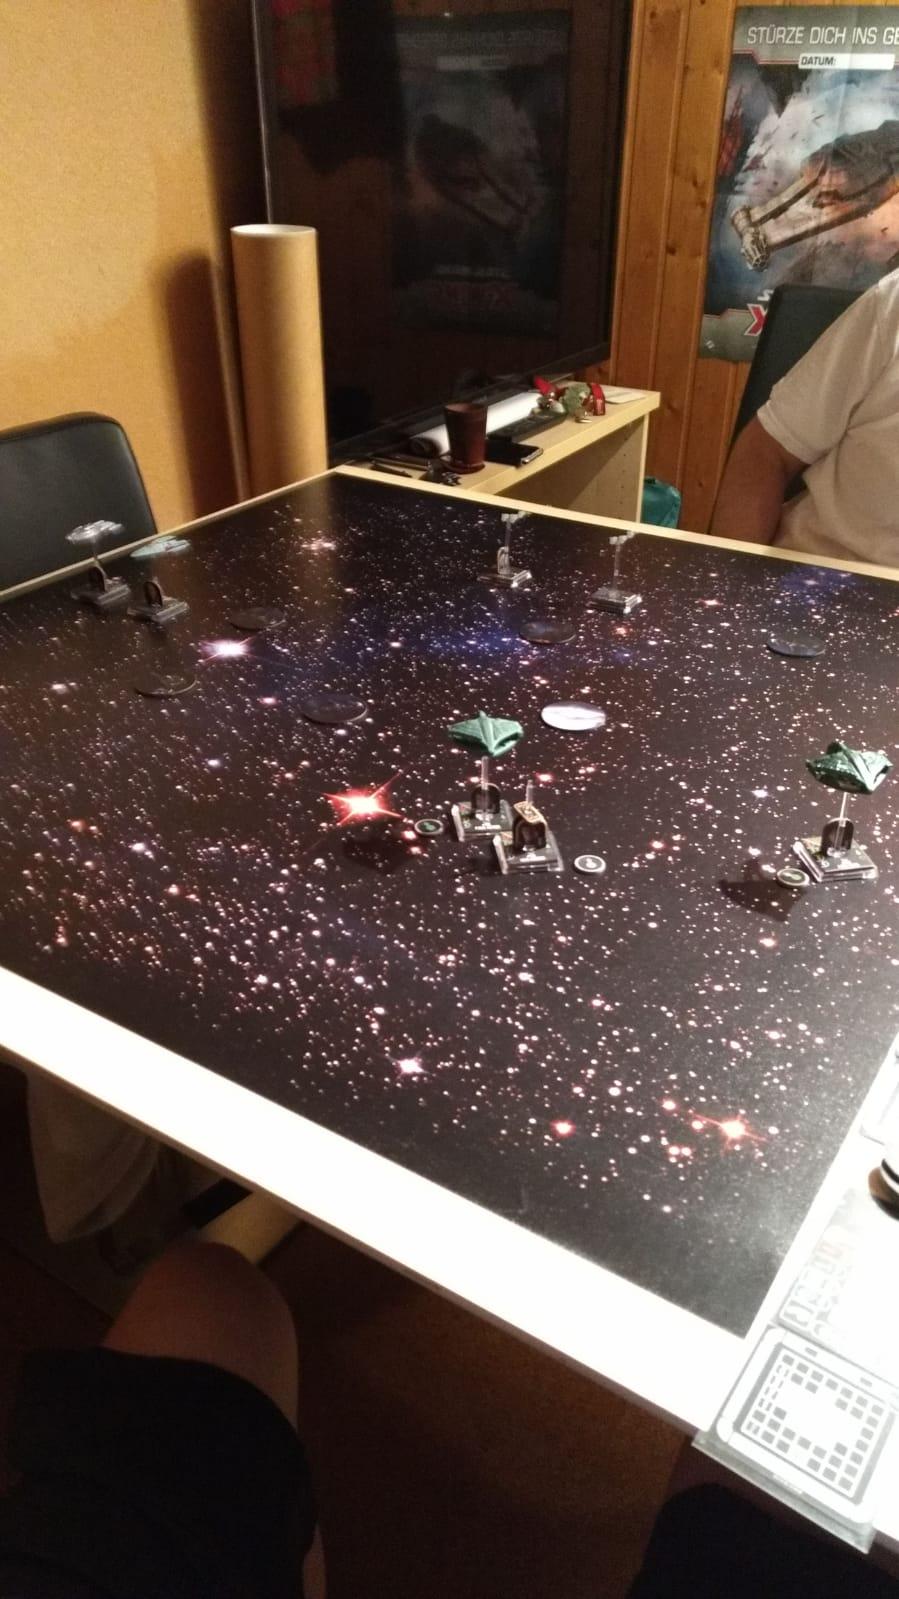 Kampf um Jouret [Föd. vs. Romulaner] Spiel410